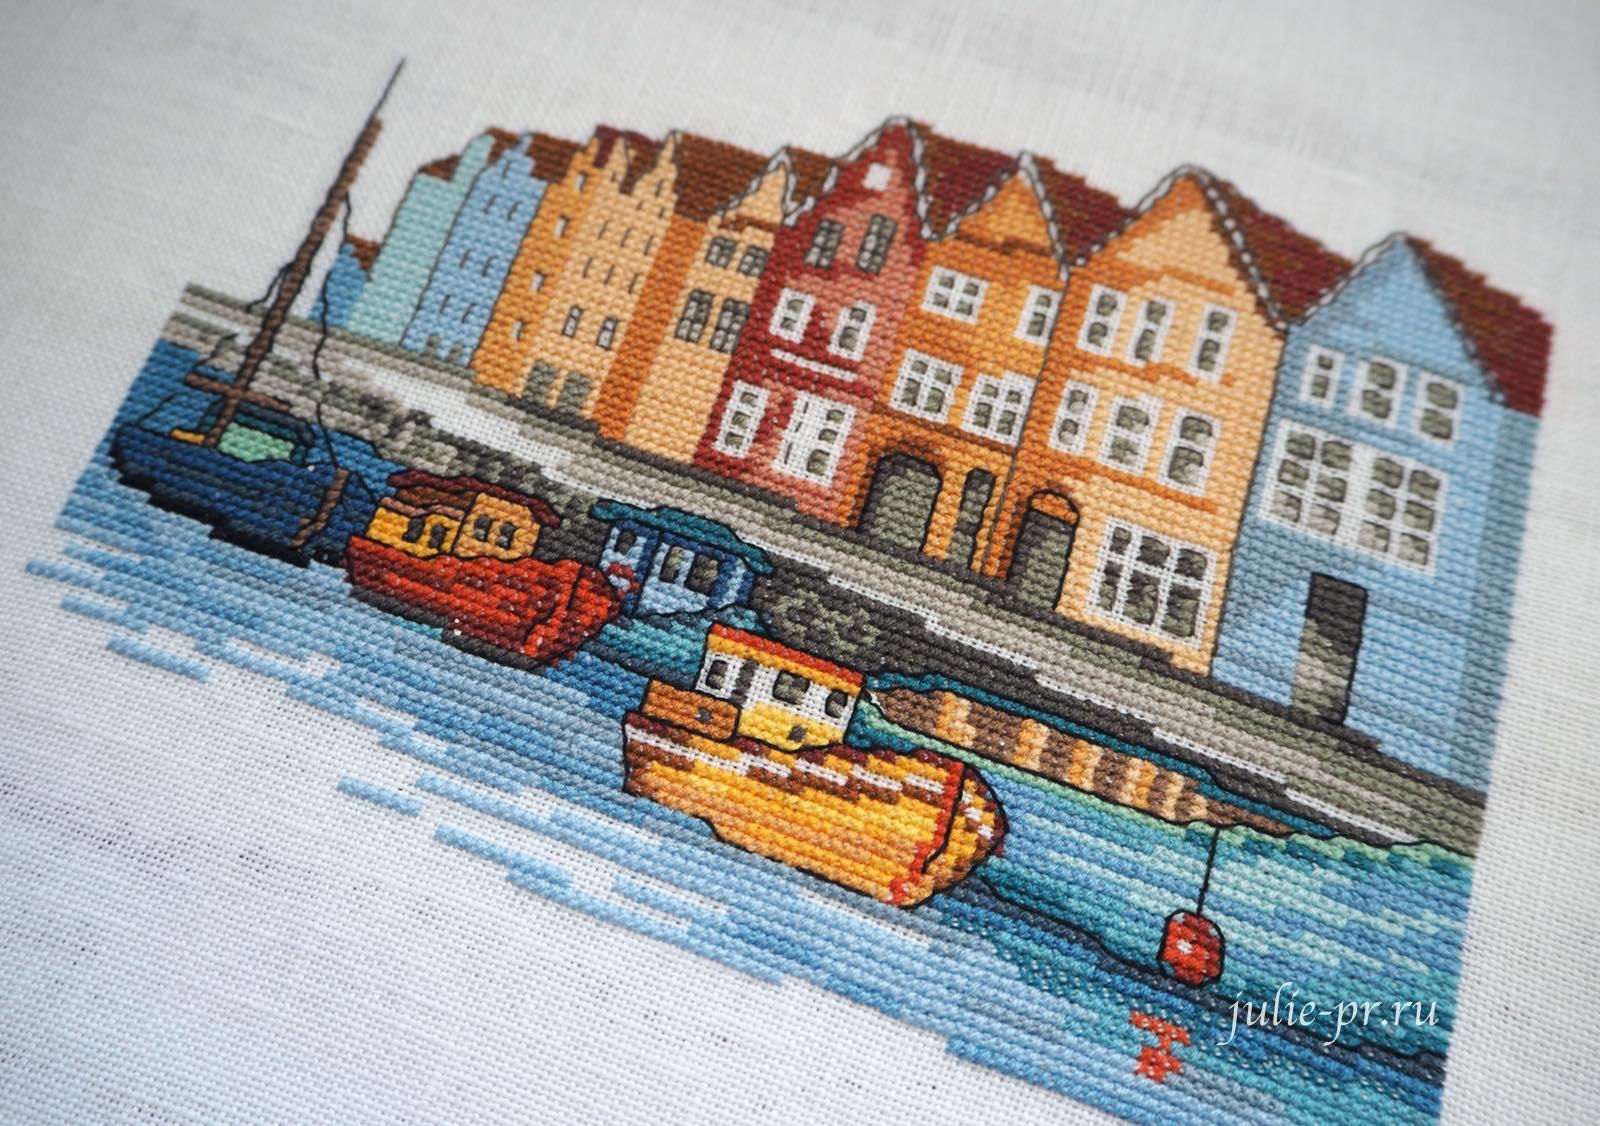 Permin 92-1169 Boats, Корабли, Берген, вышивка крестом, город, Норвегия